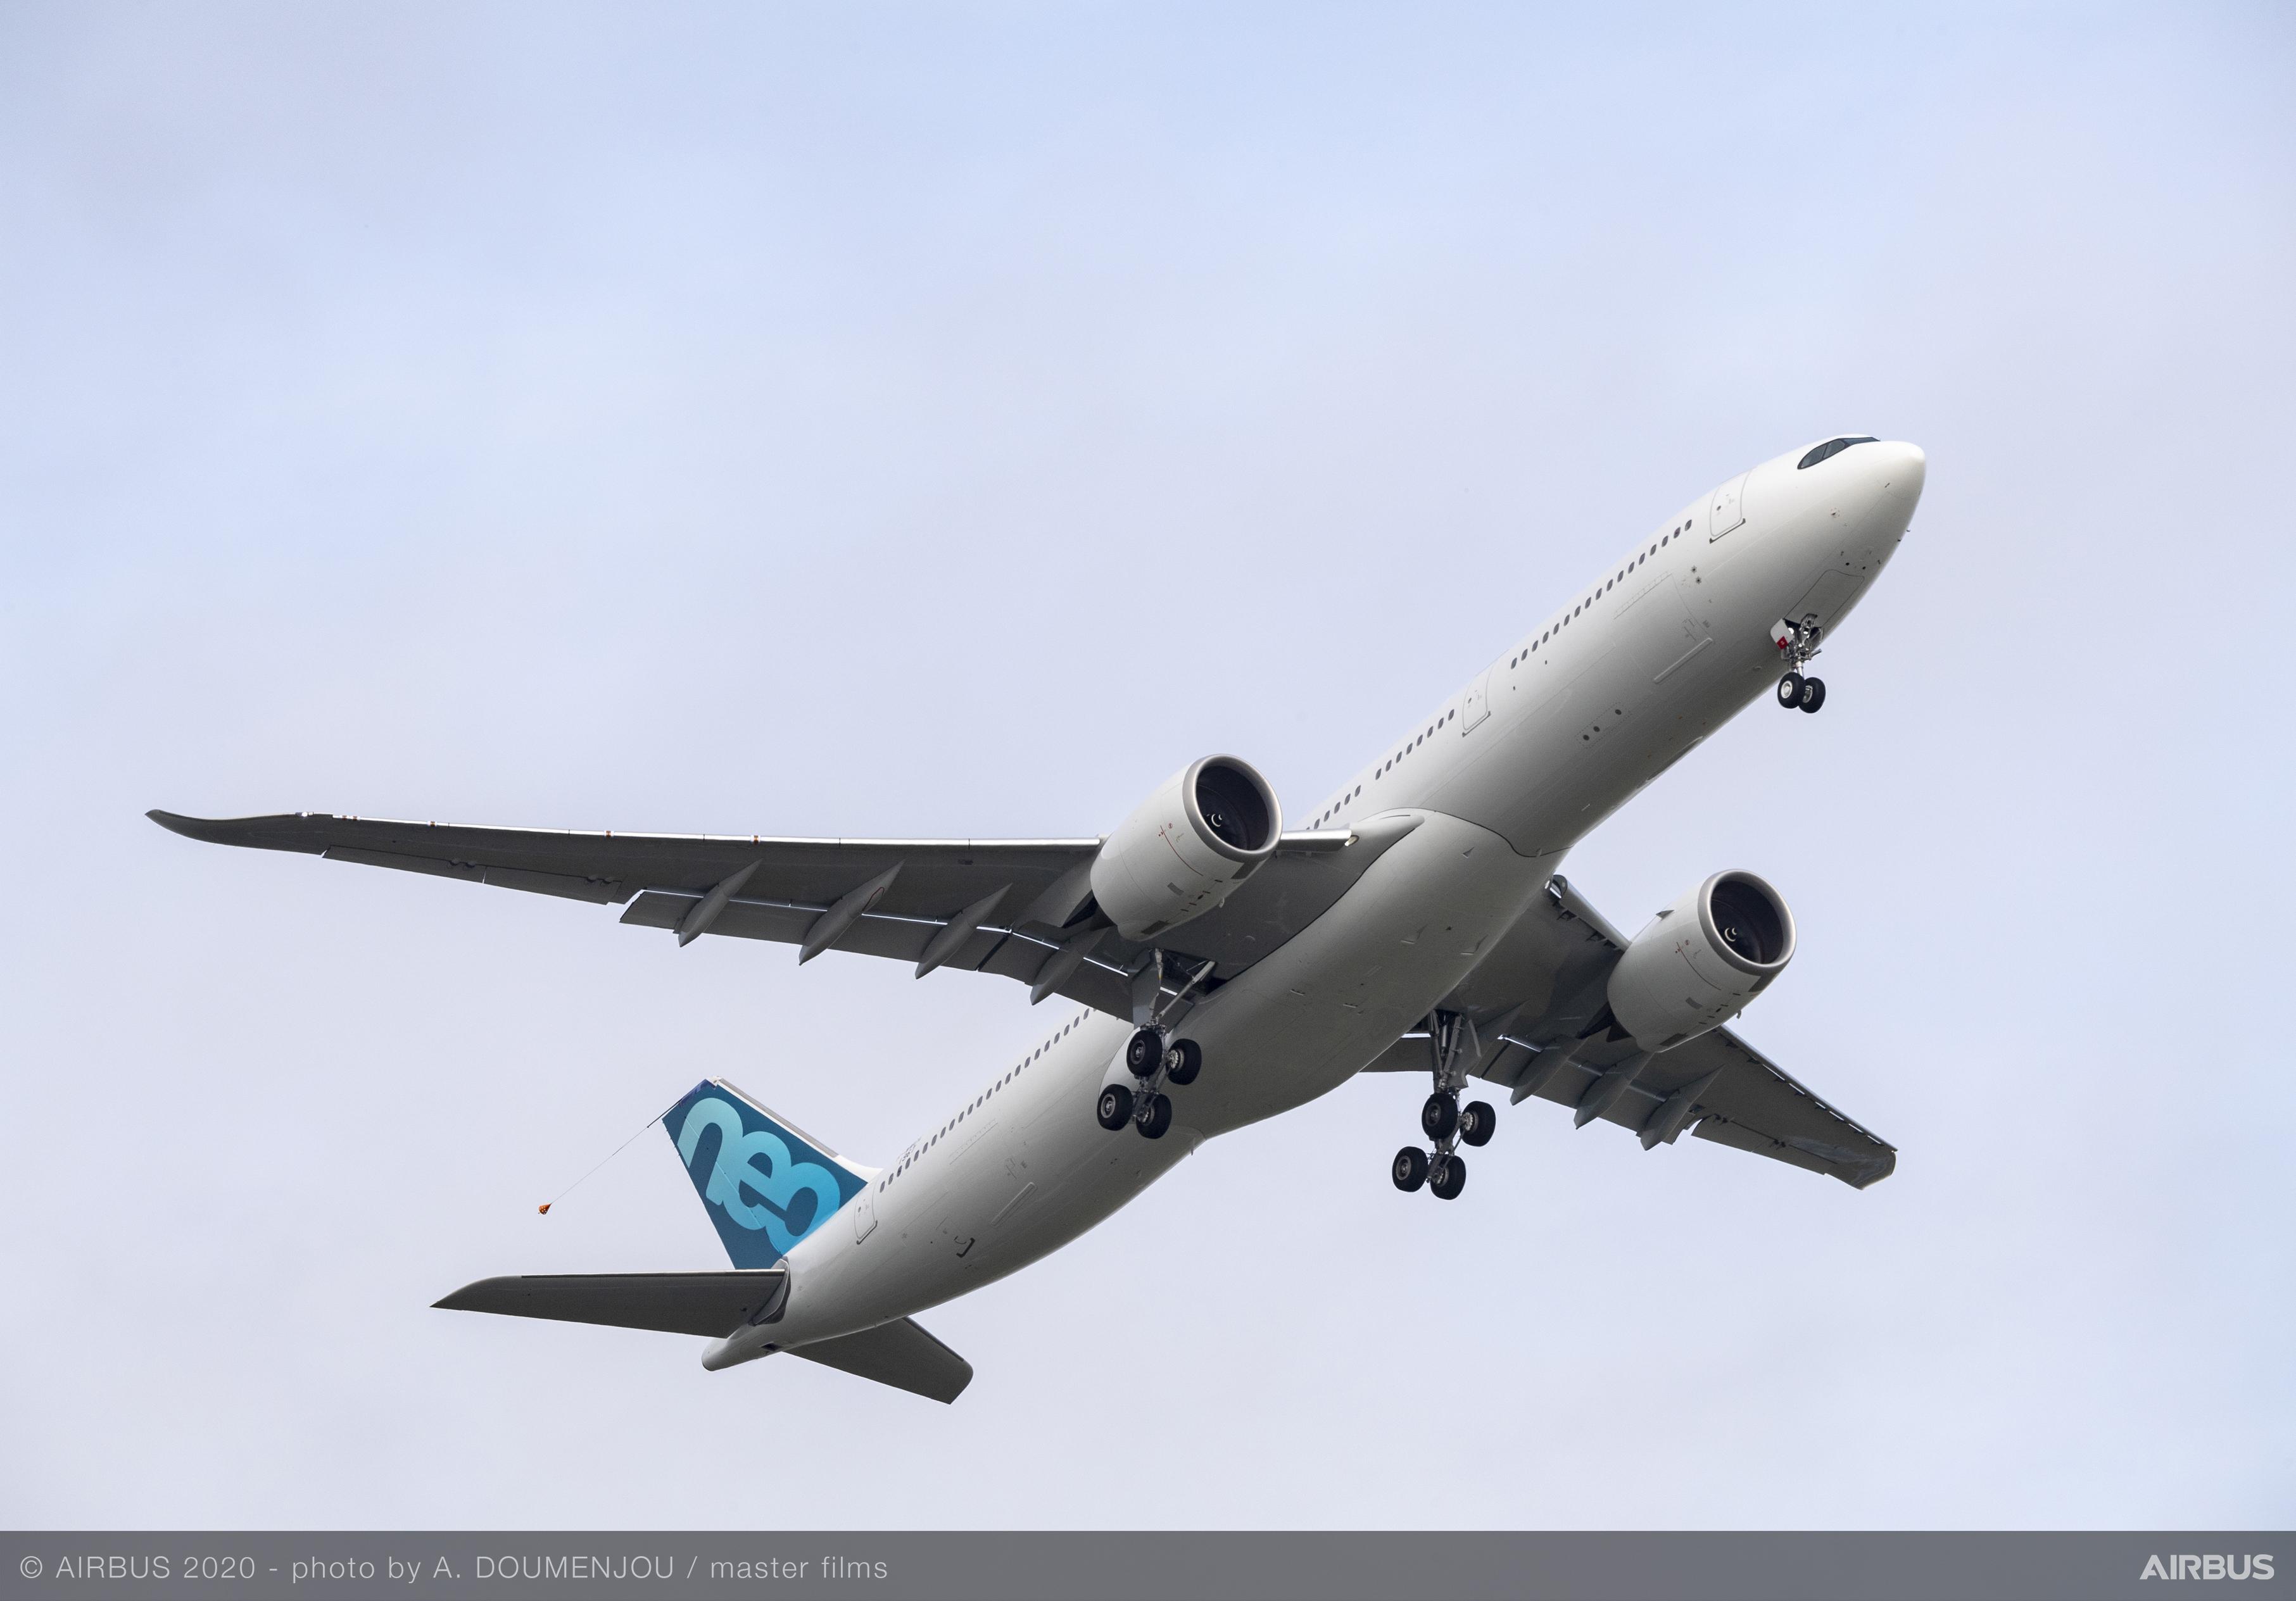 A330-900-Airbus-MSN1967-251-tonnes-first-flight-004